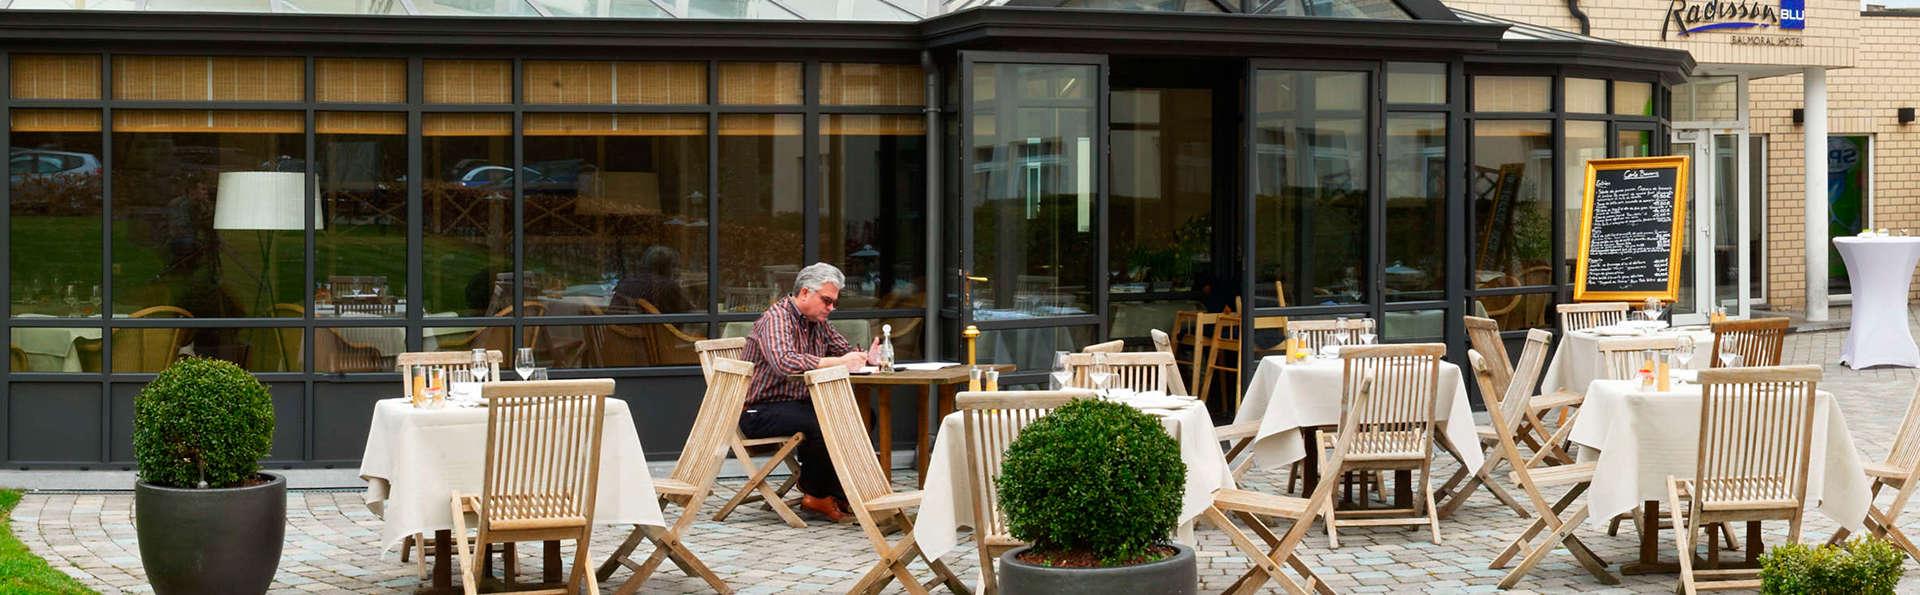 Radisson Blu Balmoral Hotel - EDIT_front3.jpg